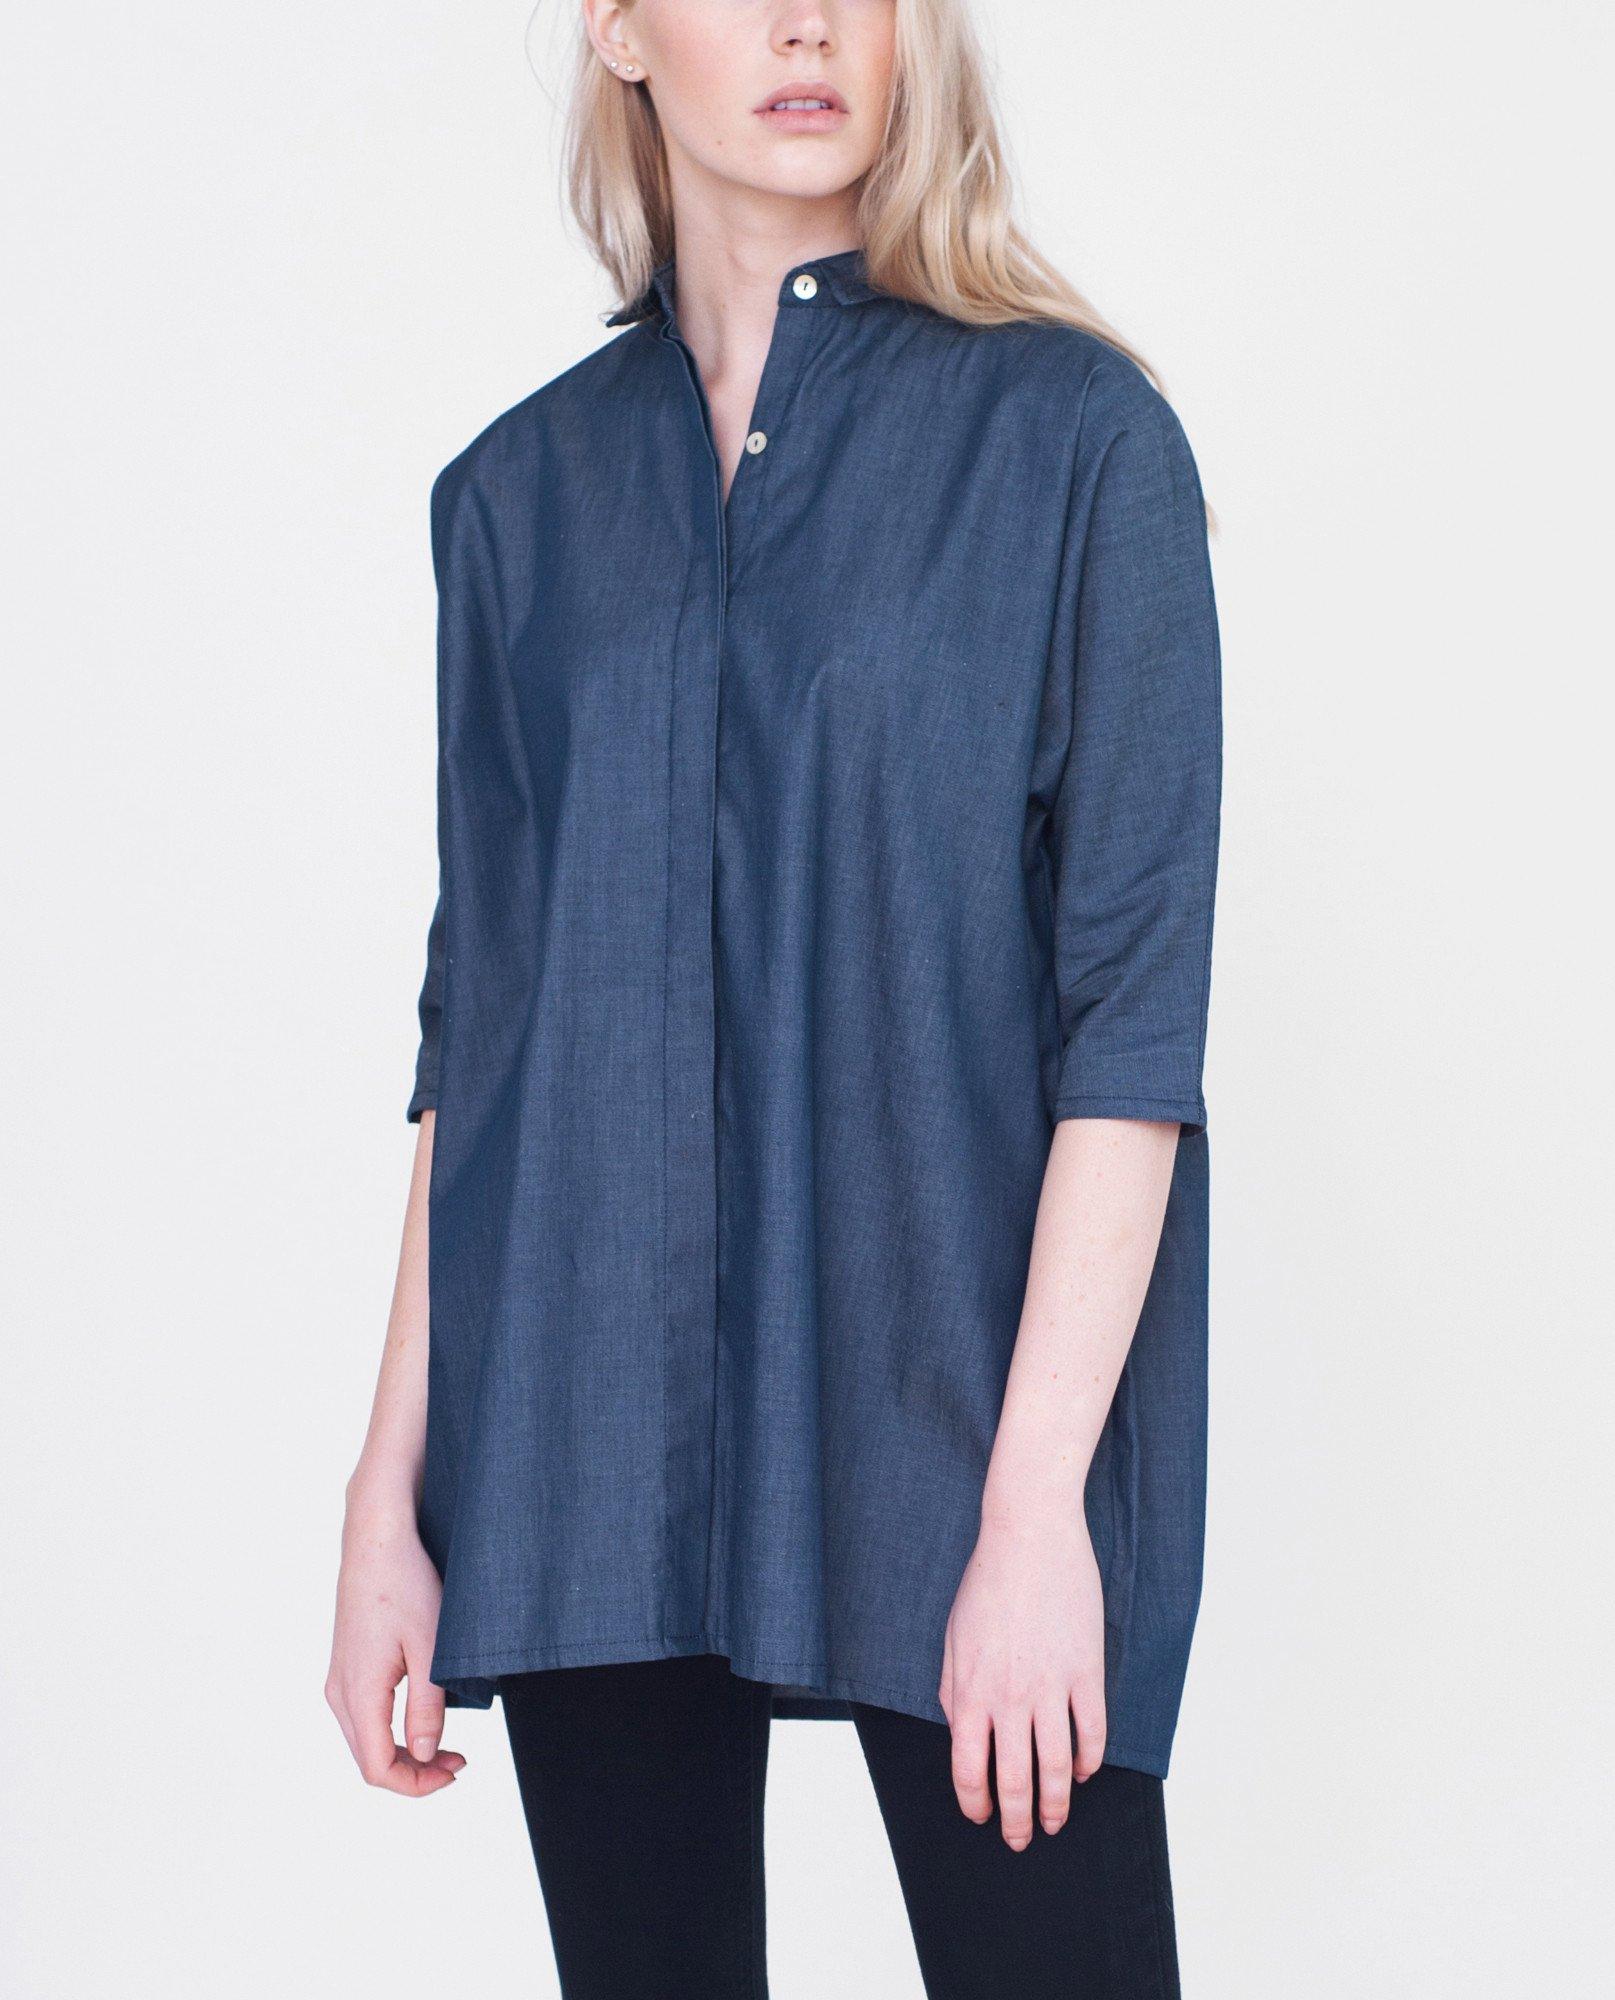 BLAINE Cotton Denim Shirt from Beaumont Organic